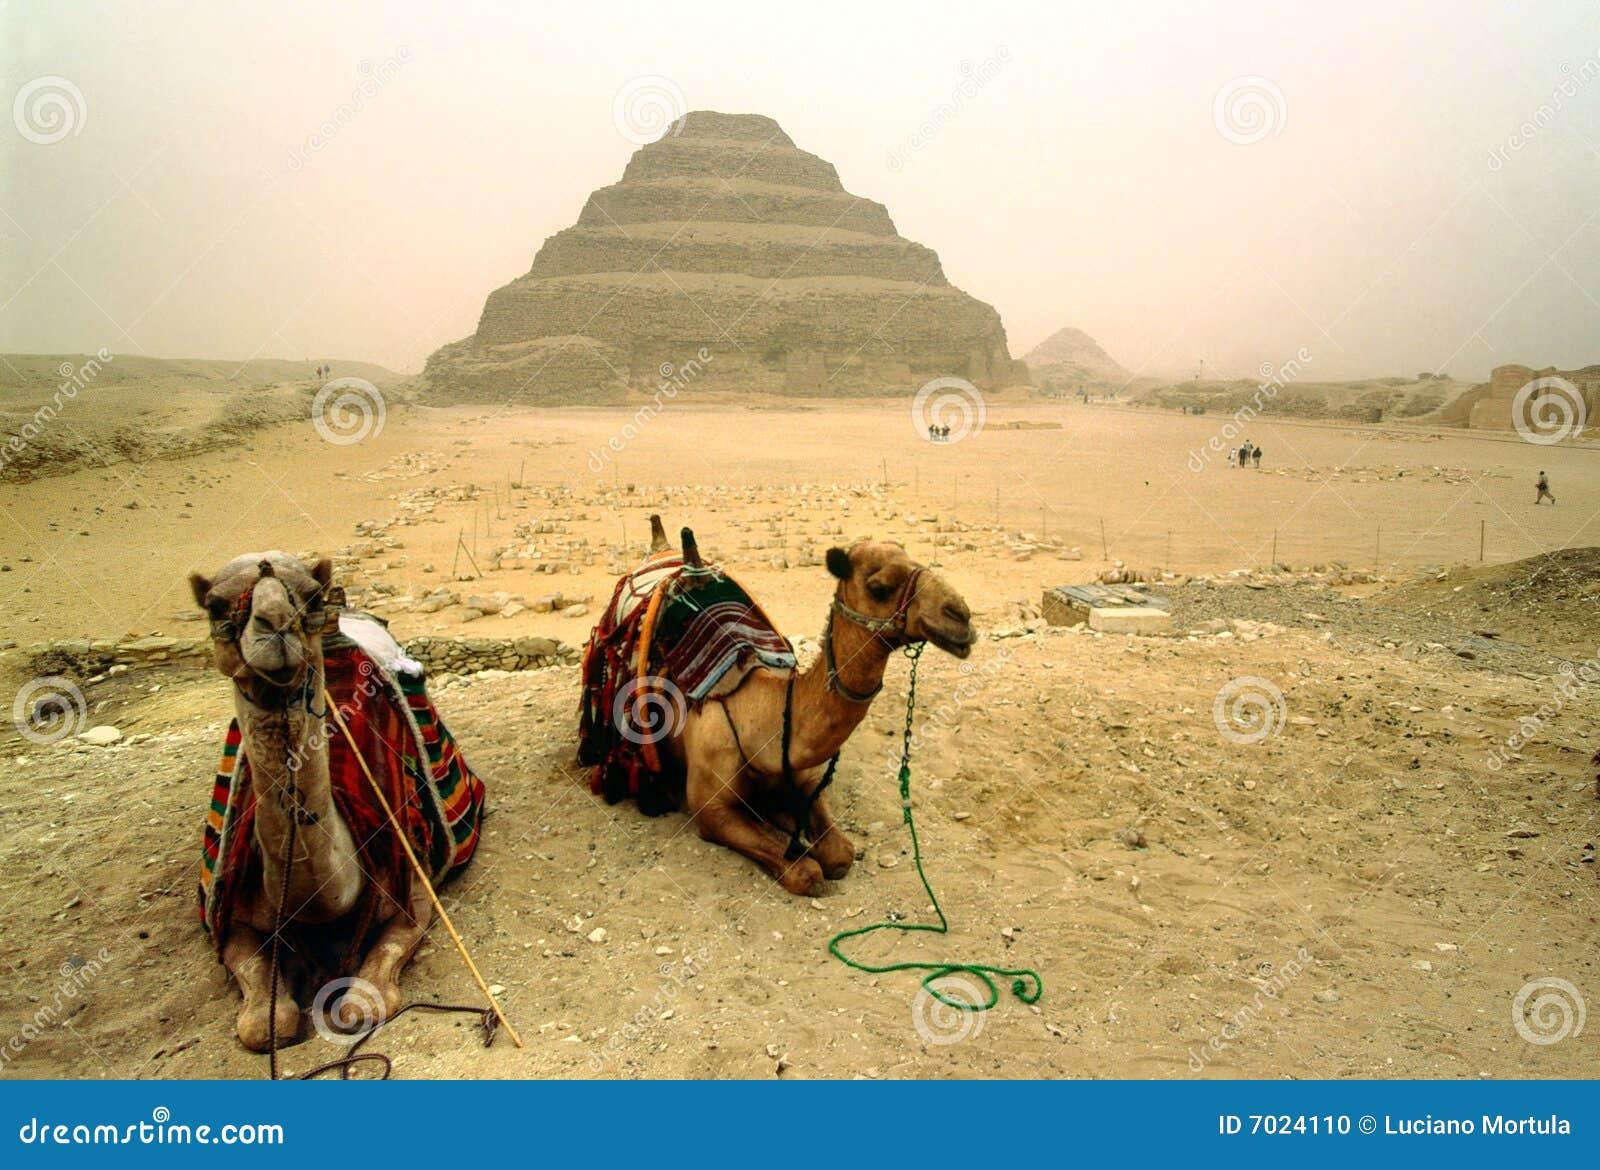 Saqqara, Egypt.